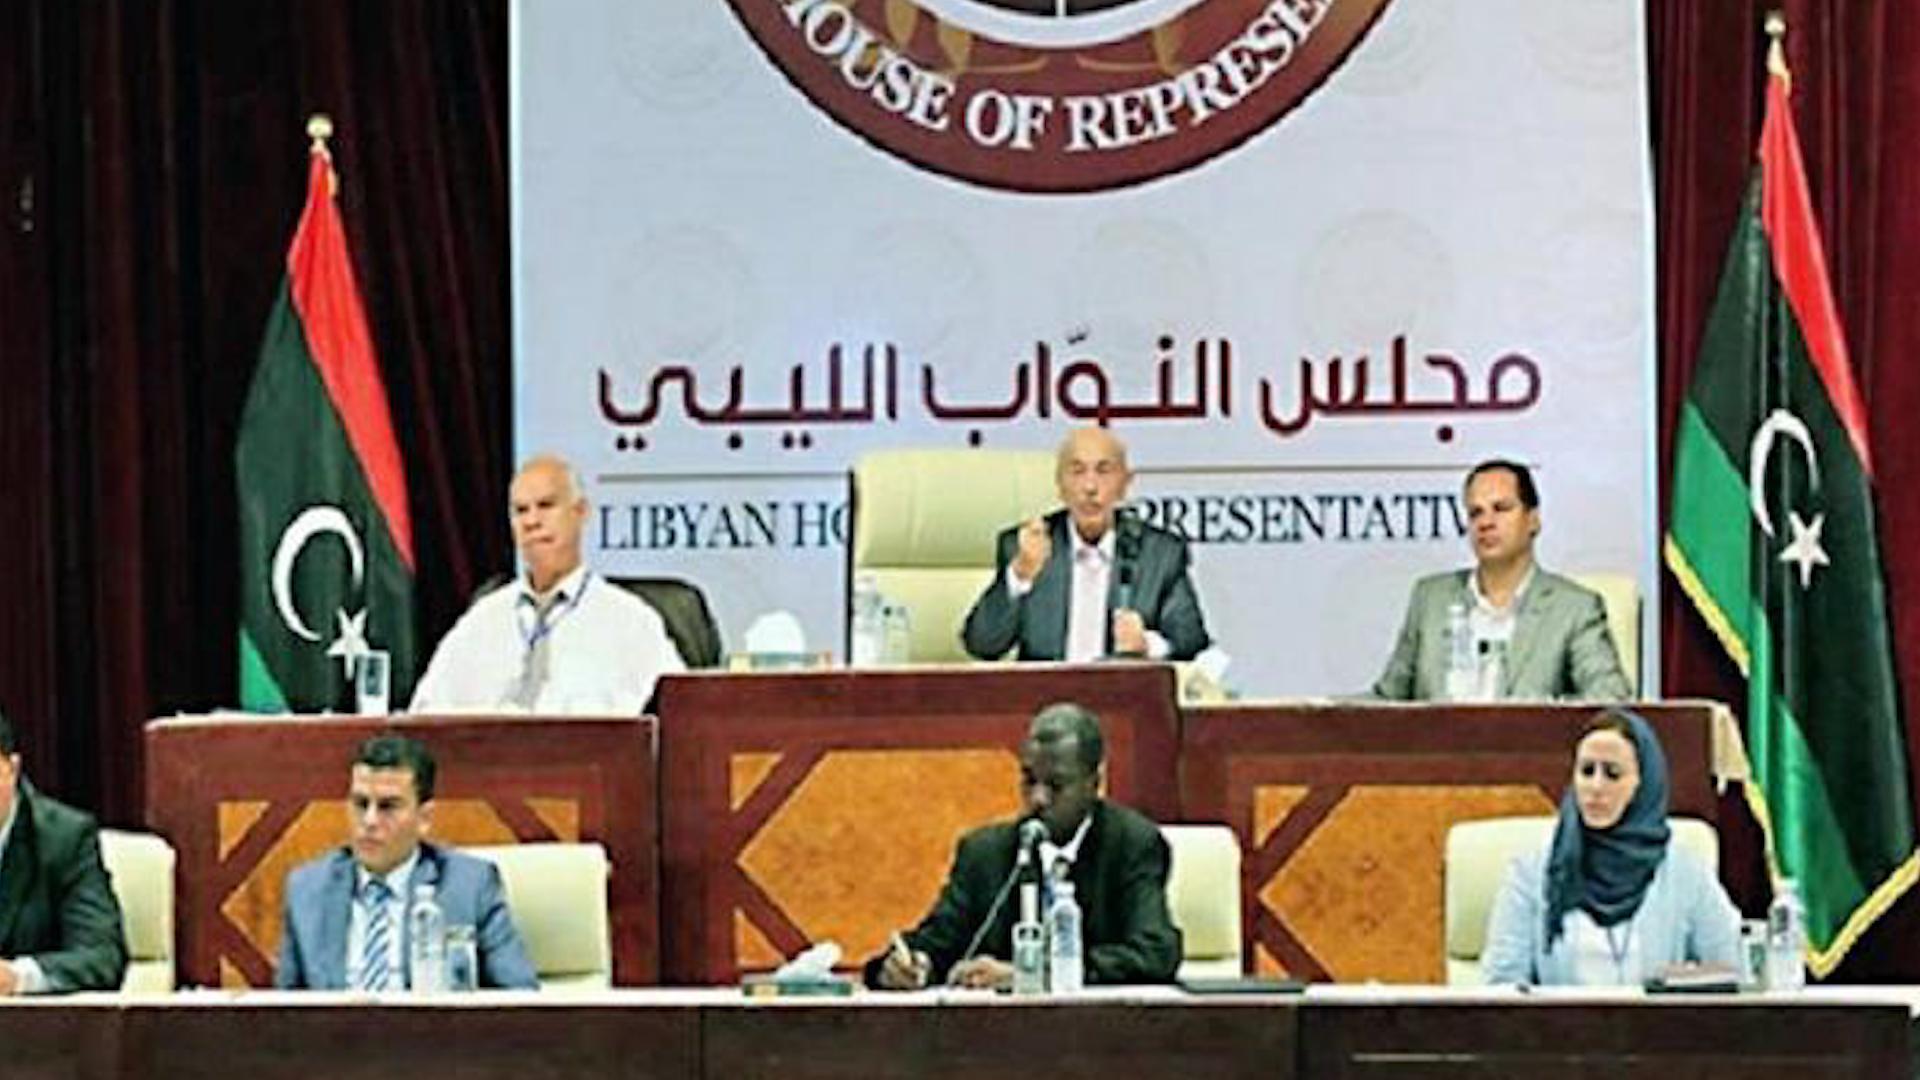 Photo of مجلس النواب الليبي :تركيا تهدف لتزويد الإرهابيين بالسلاح وما قام به السراج خيانة عظمى